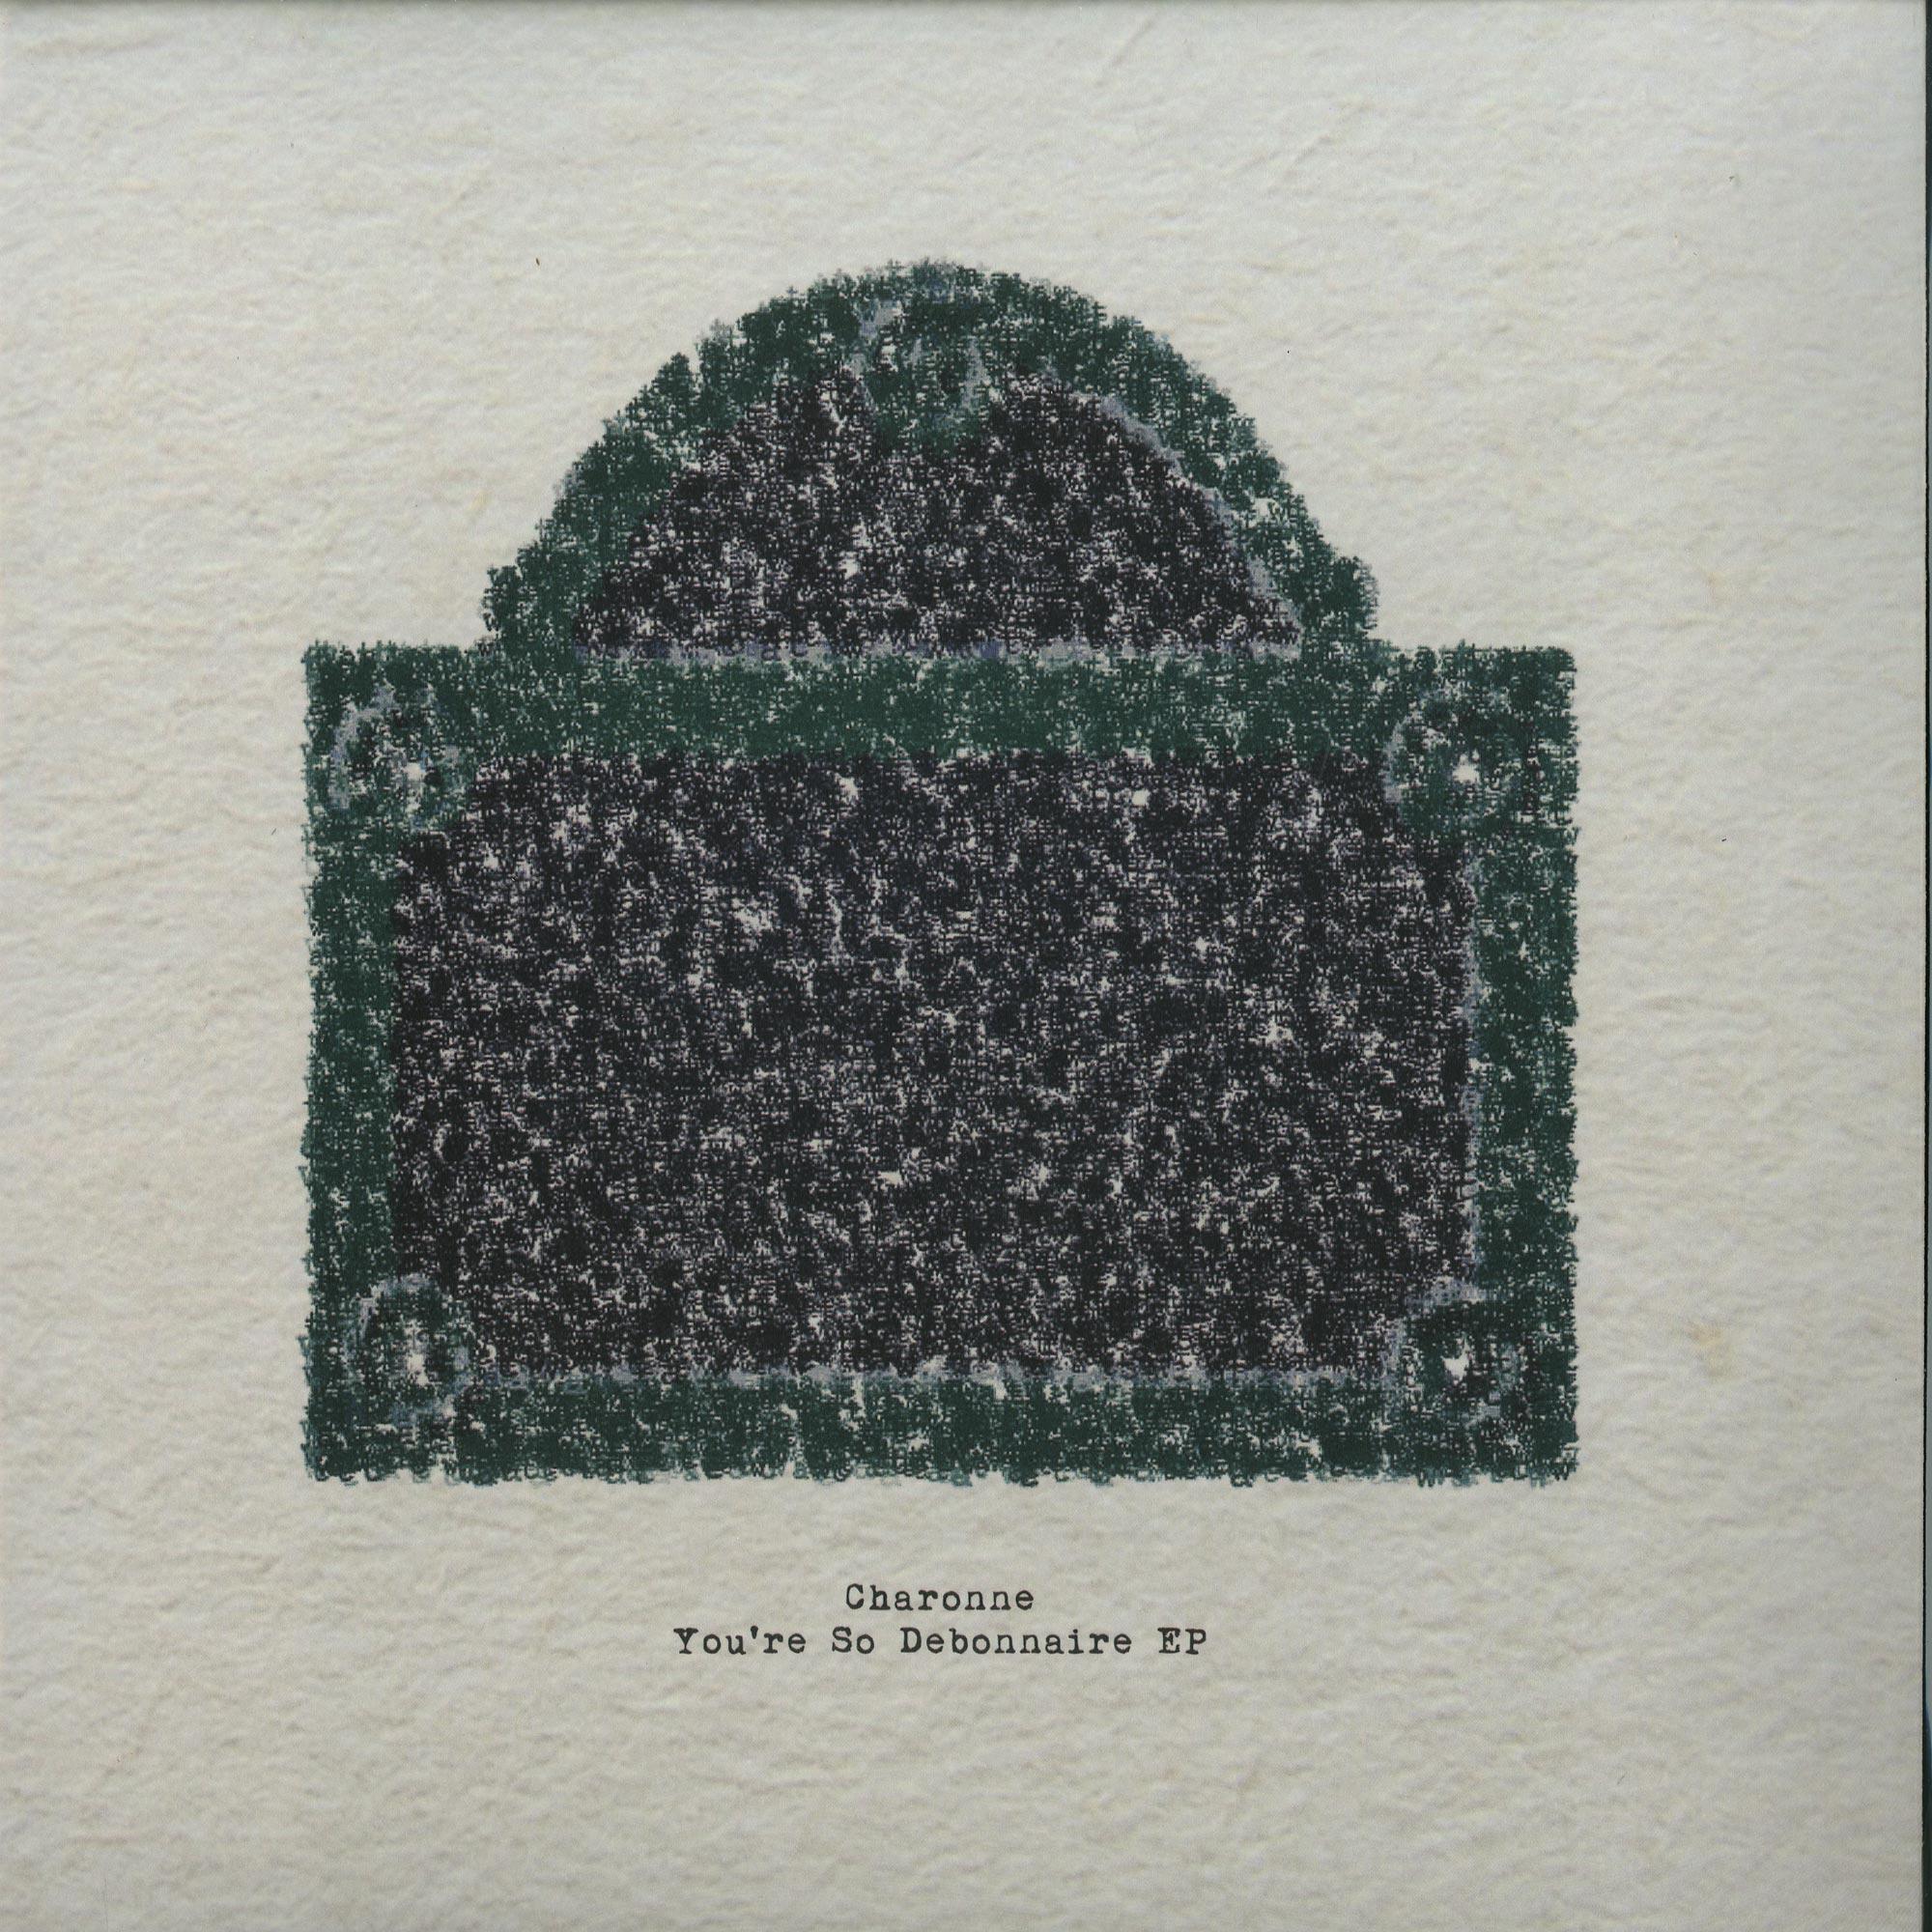 Charonne - YOURE SO DEBONNAIRE EP / AKUFEN RMX